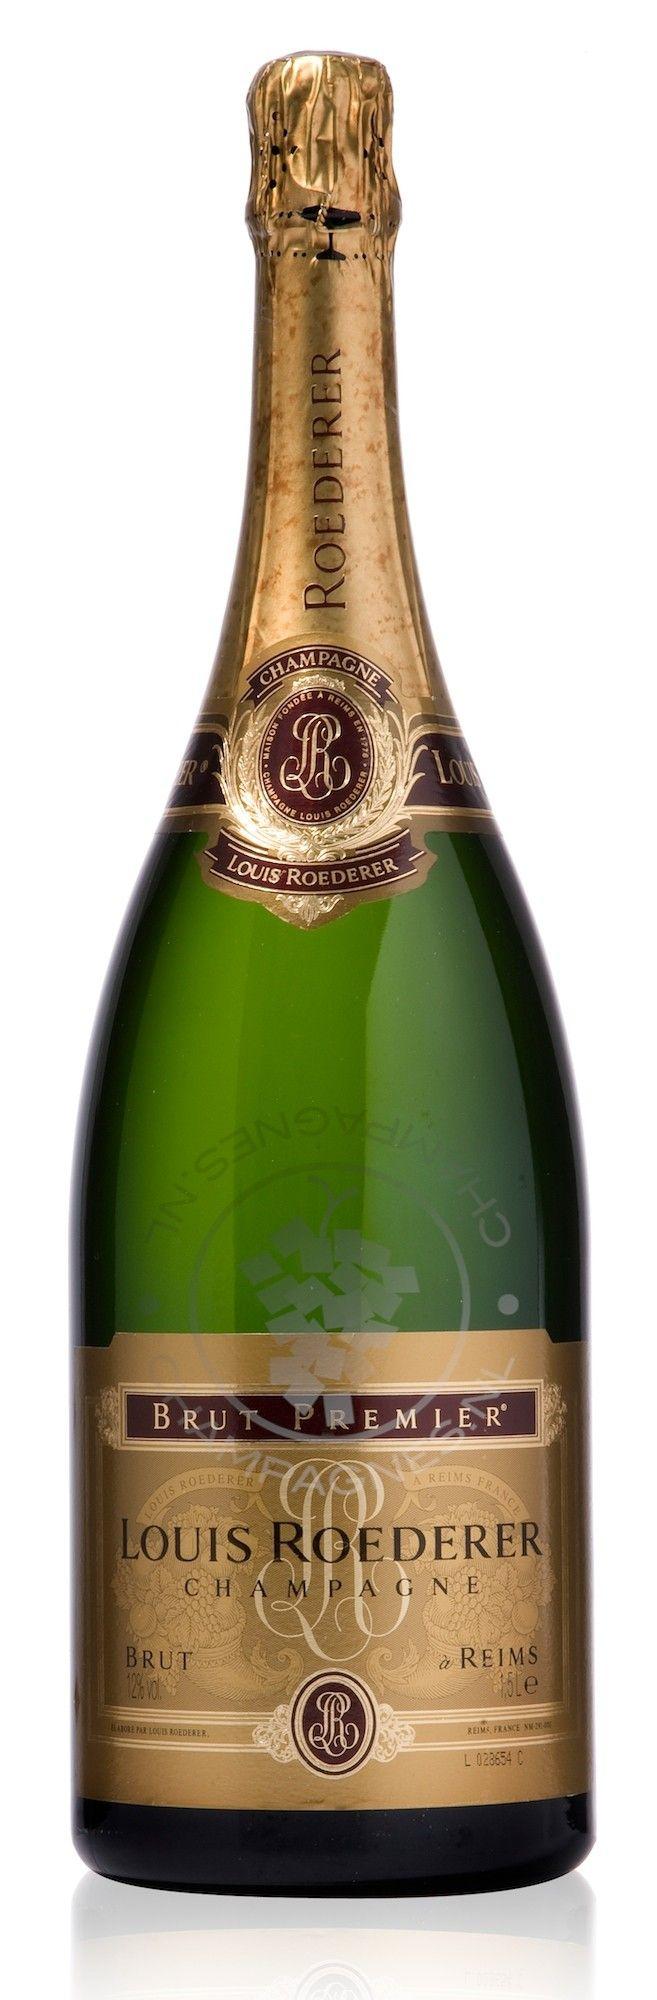 Louis Roederer - Brut Premier Magnum Champagne Bestellen - Champagnes.nl